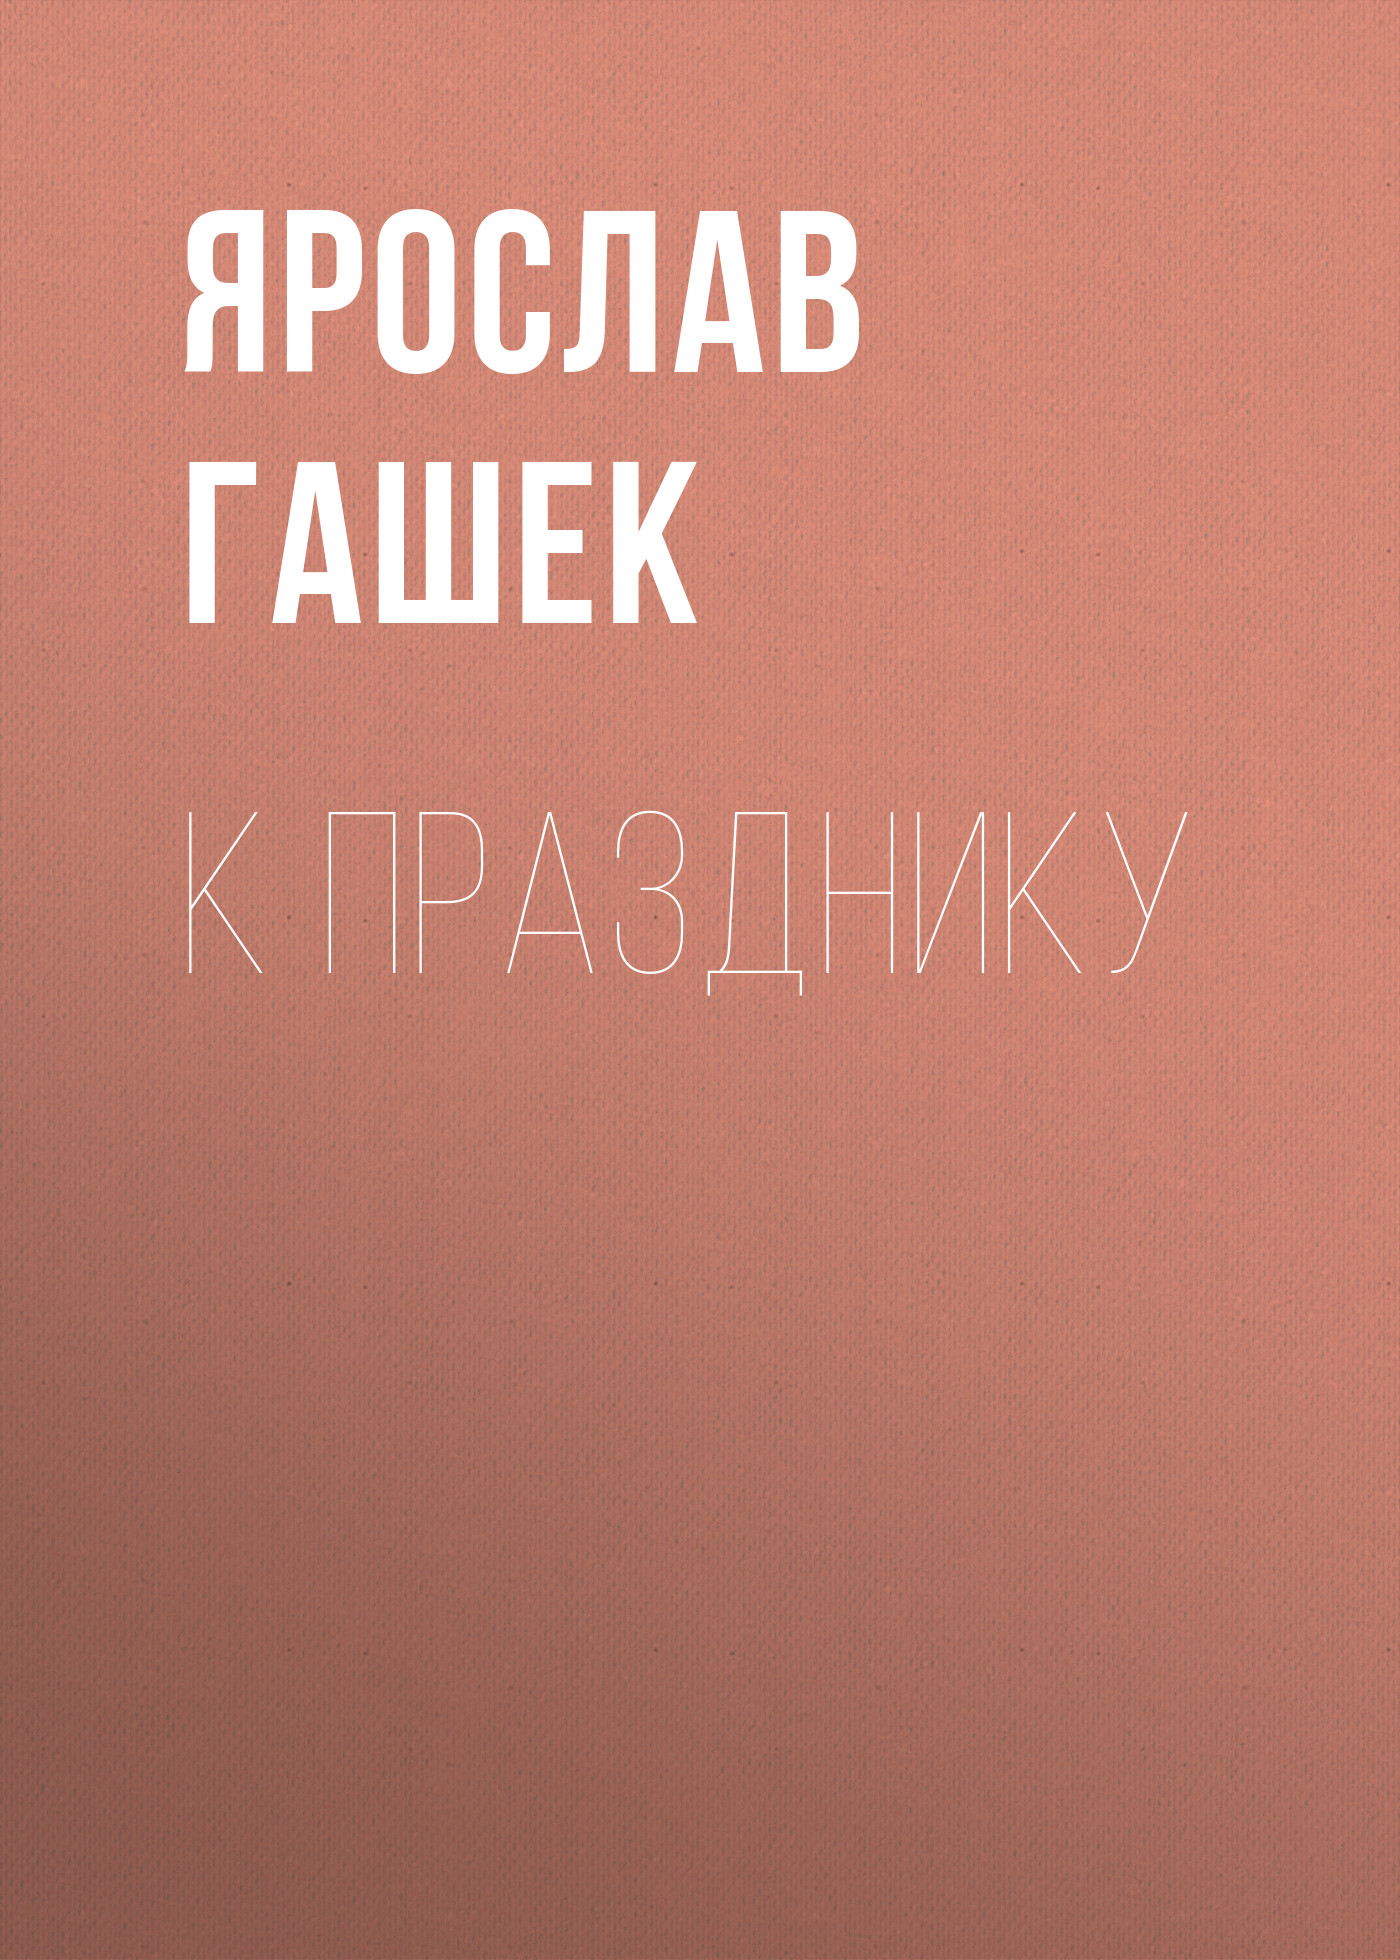 Ярослав Гашек К празднику ярослав гашек к празднику